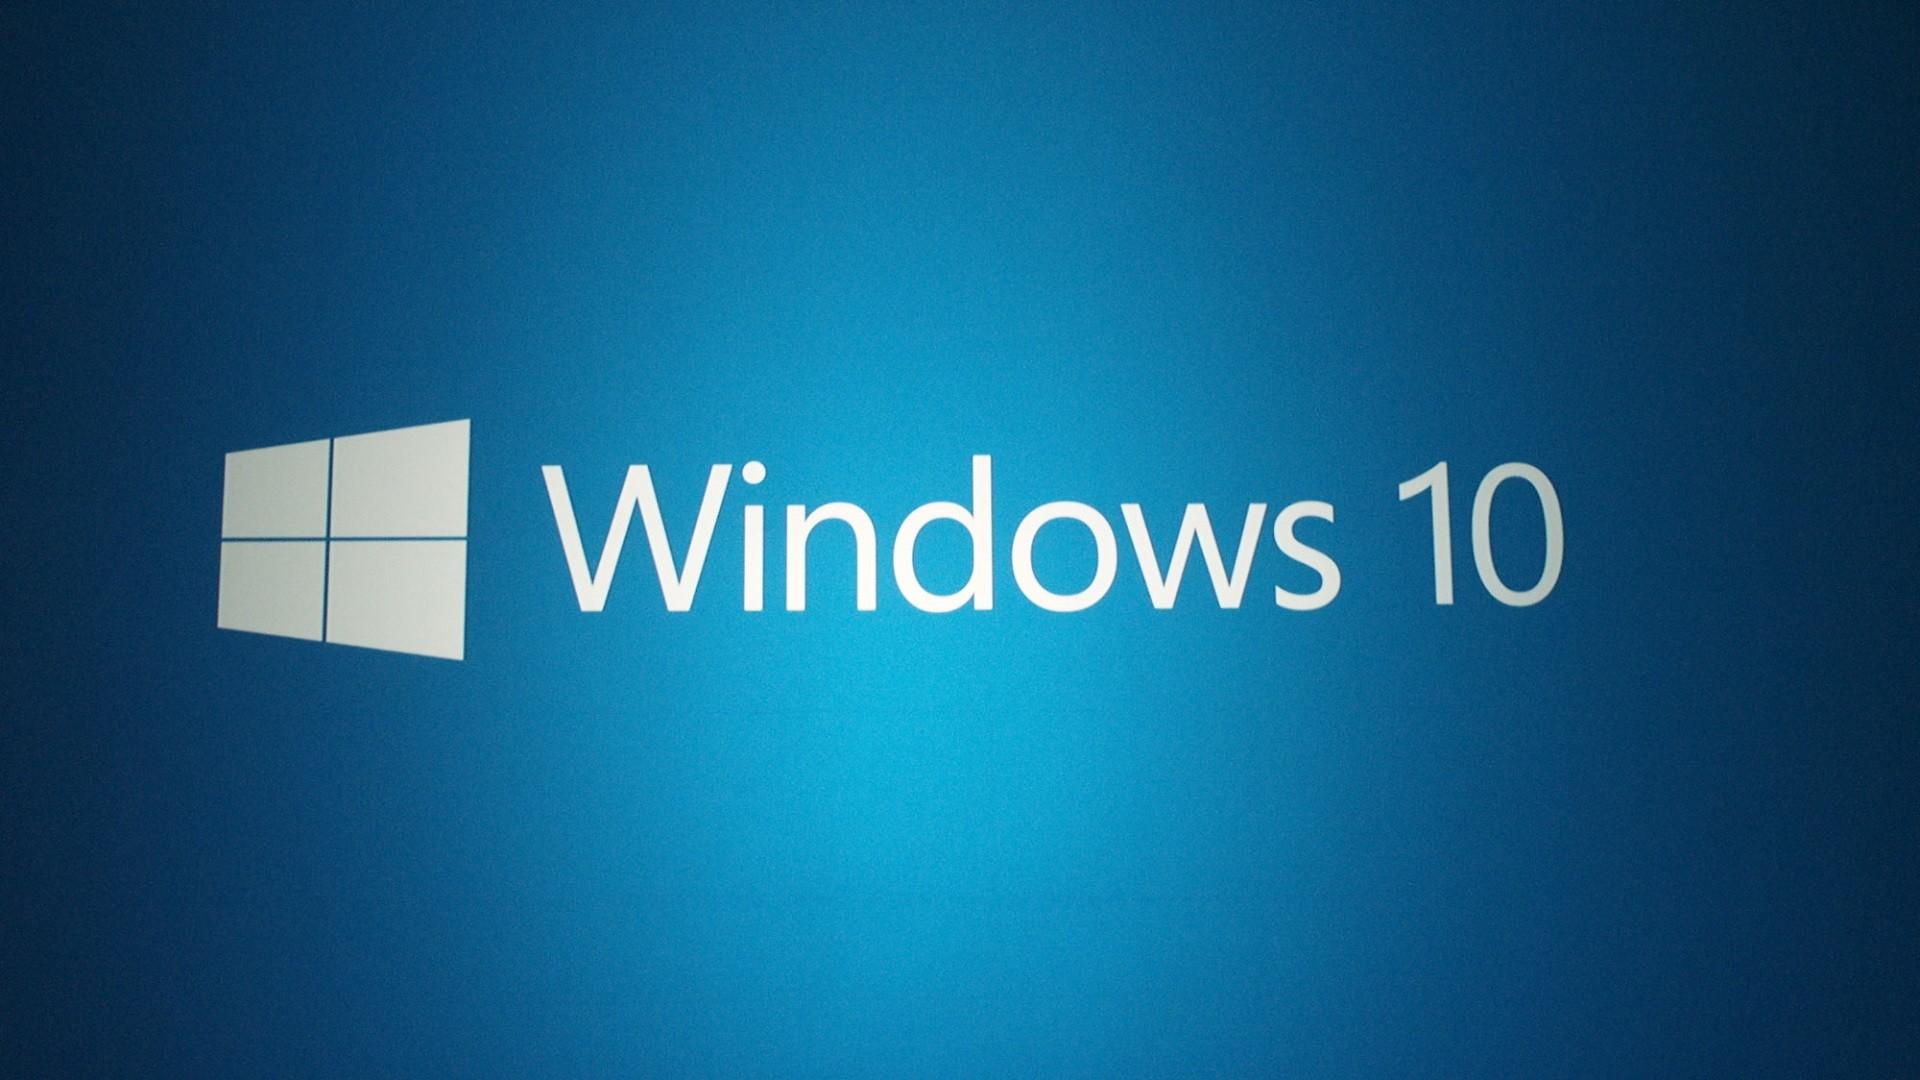 Windows 10 desktop wallpaper 1920 x 1080 – ImgSnap.com